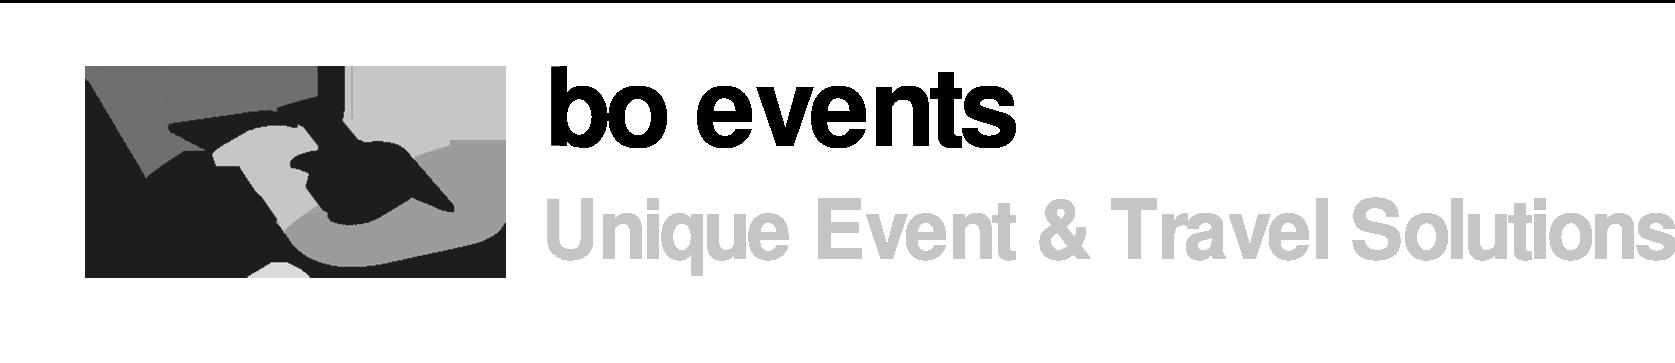 bo events - Unique Event & Travel Solutions